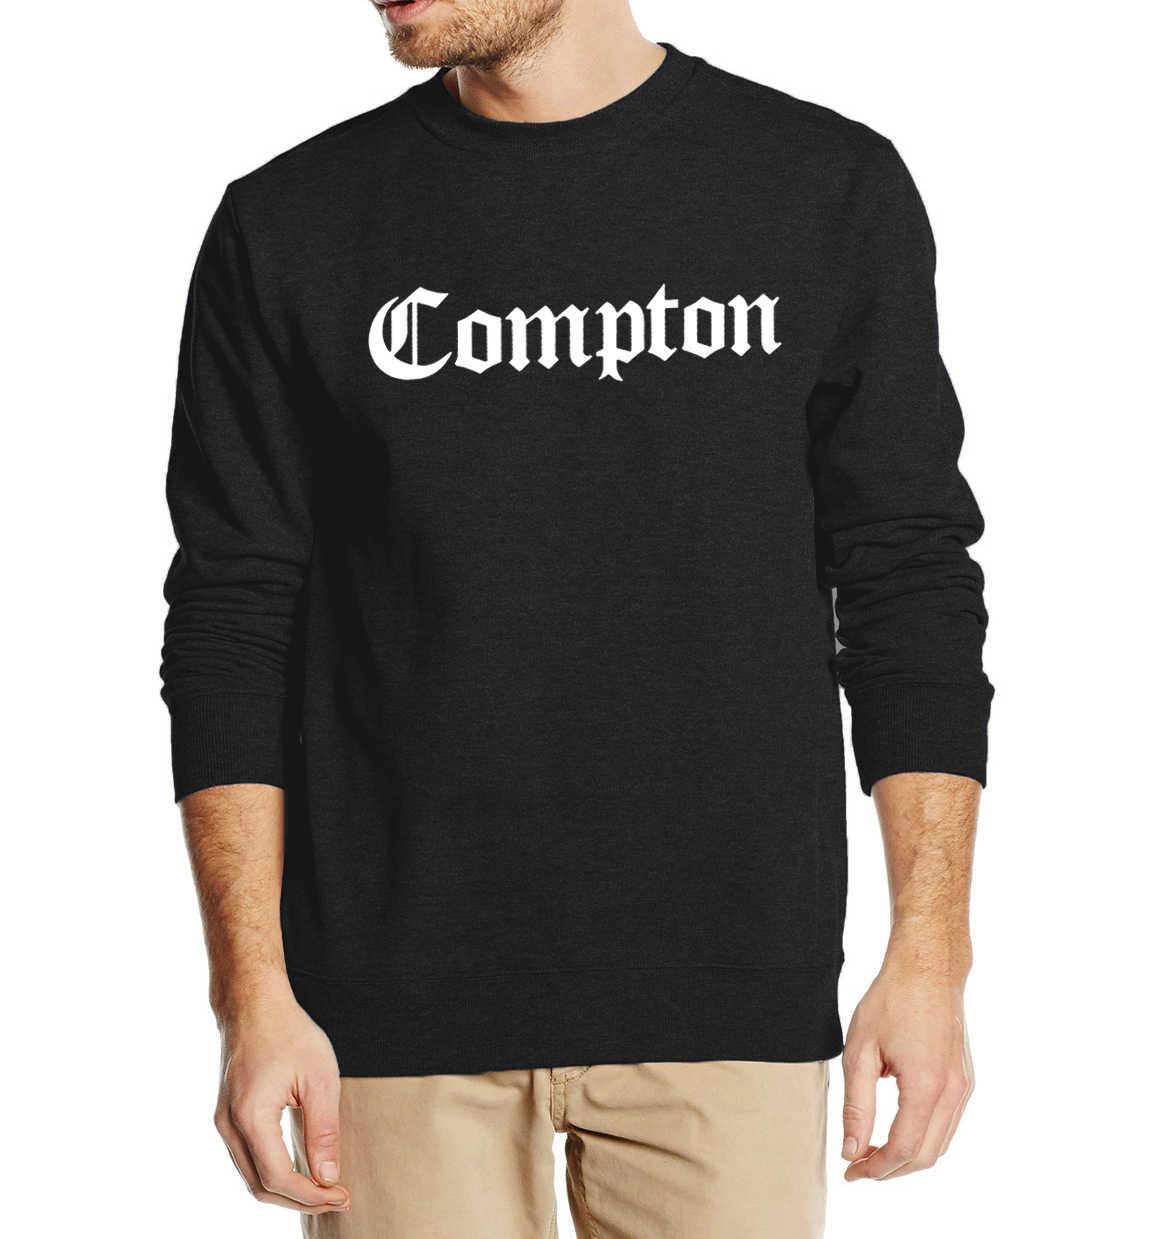 hip hop style autumn winter 2017 new fashion Compton print sweatshirt men  hoodies cool streetwear tracksuit db9b1d8e596